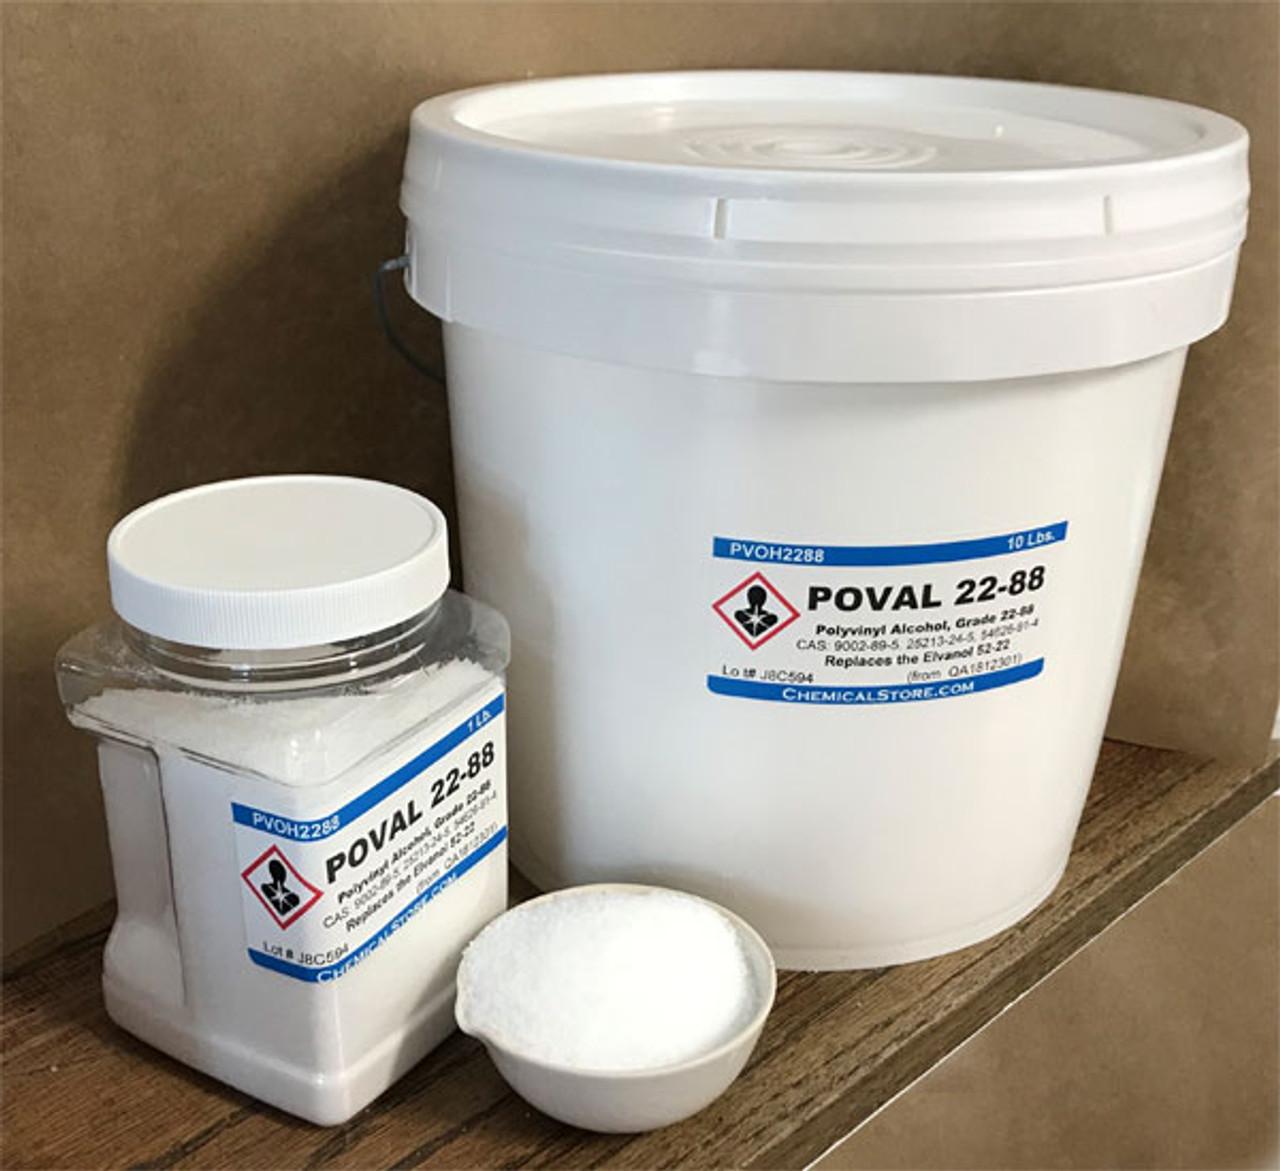 Polyvinylalcohol grade 22-88, PVA 217, Elvanol 52-22